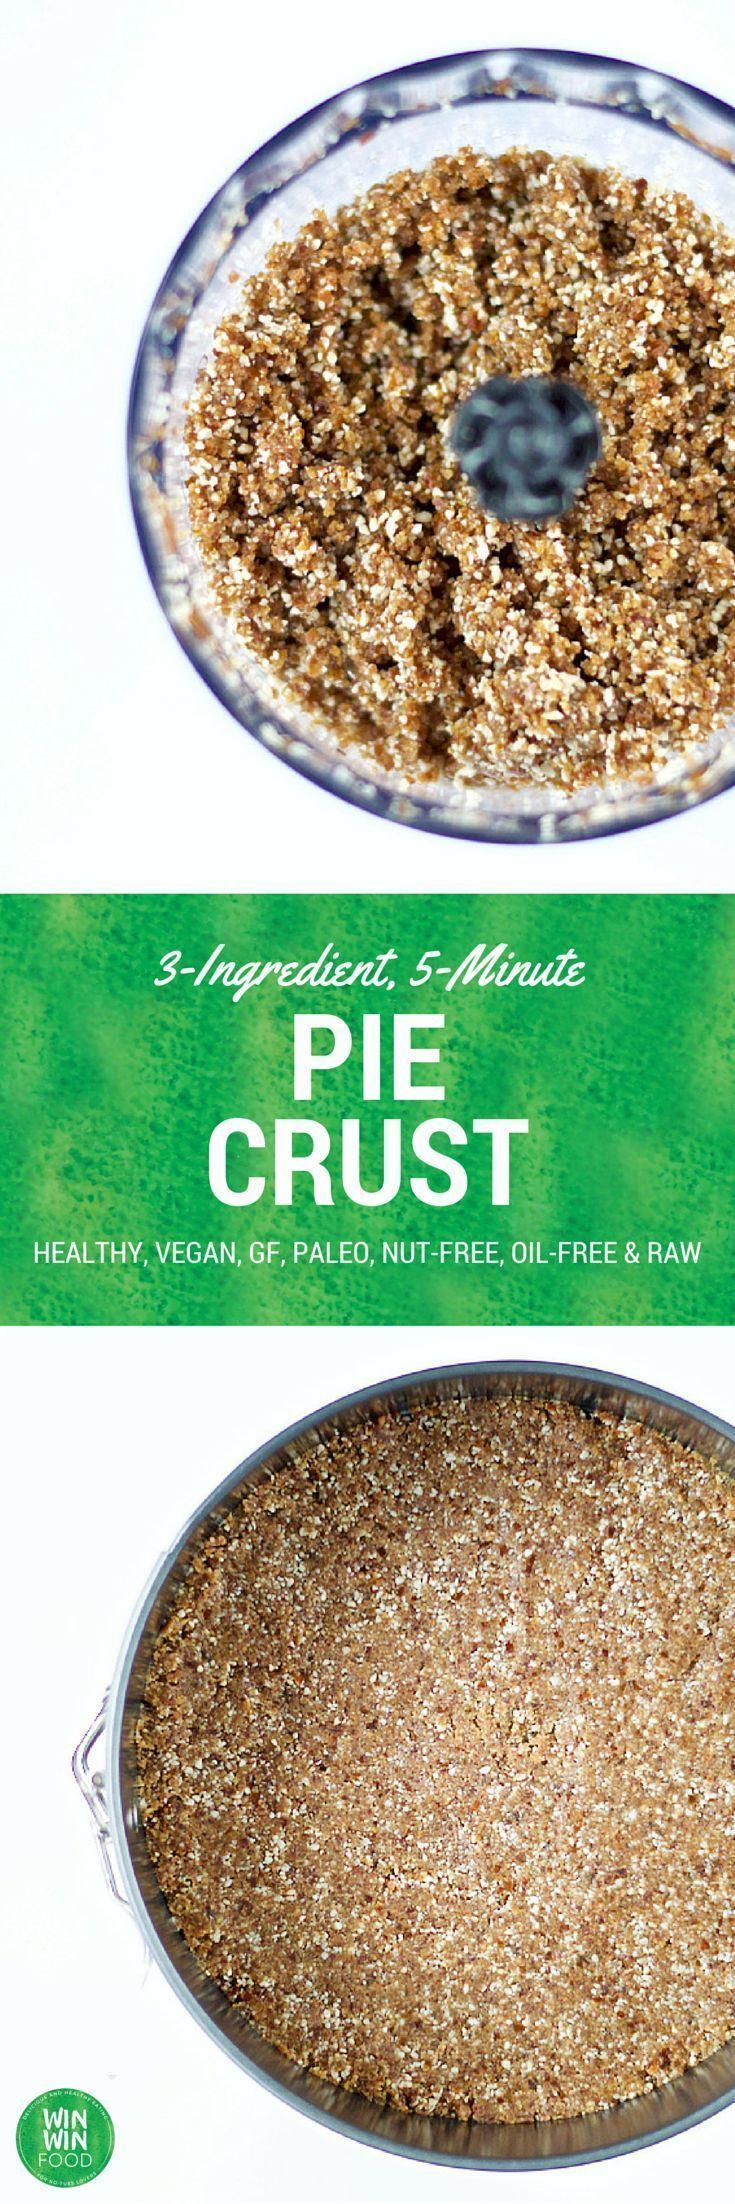 3-Ingredient, 5-Minute, Nut-Free Paleo Pie Crust | WIN-WINFOOD.com #healthy #vegan #raw #paleo #glutenfree #nutfree #oilfree